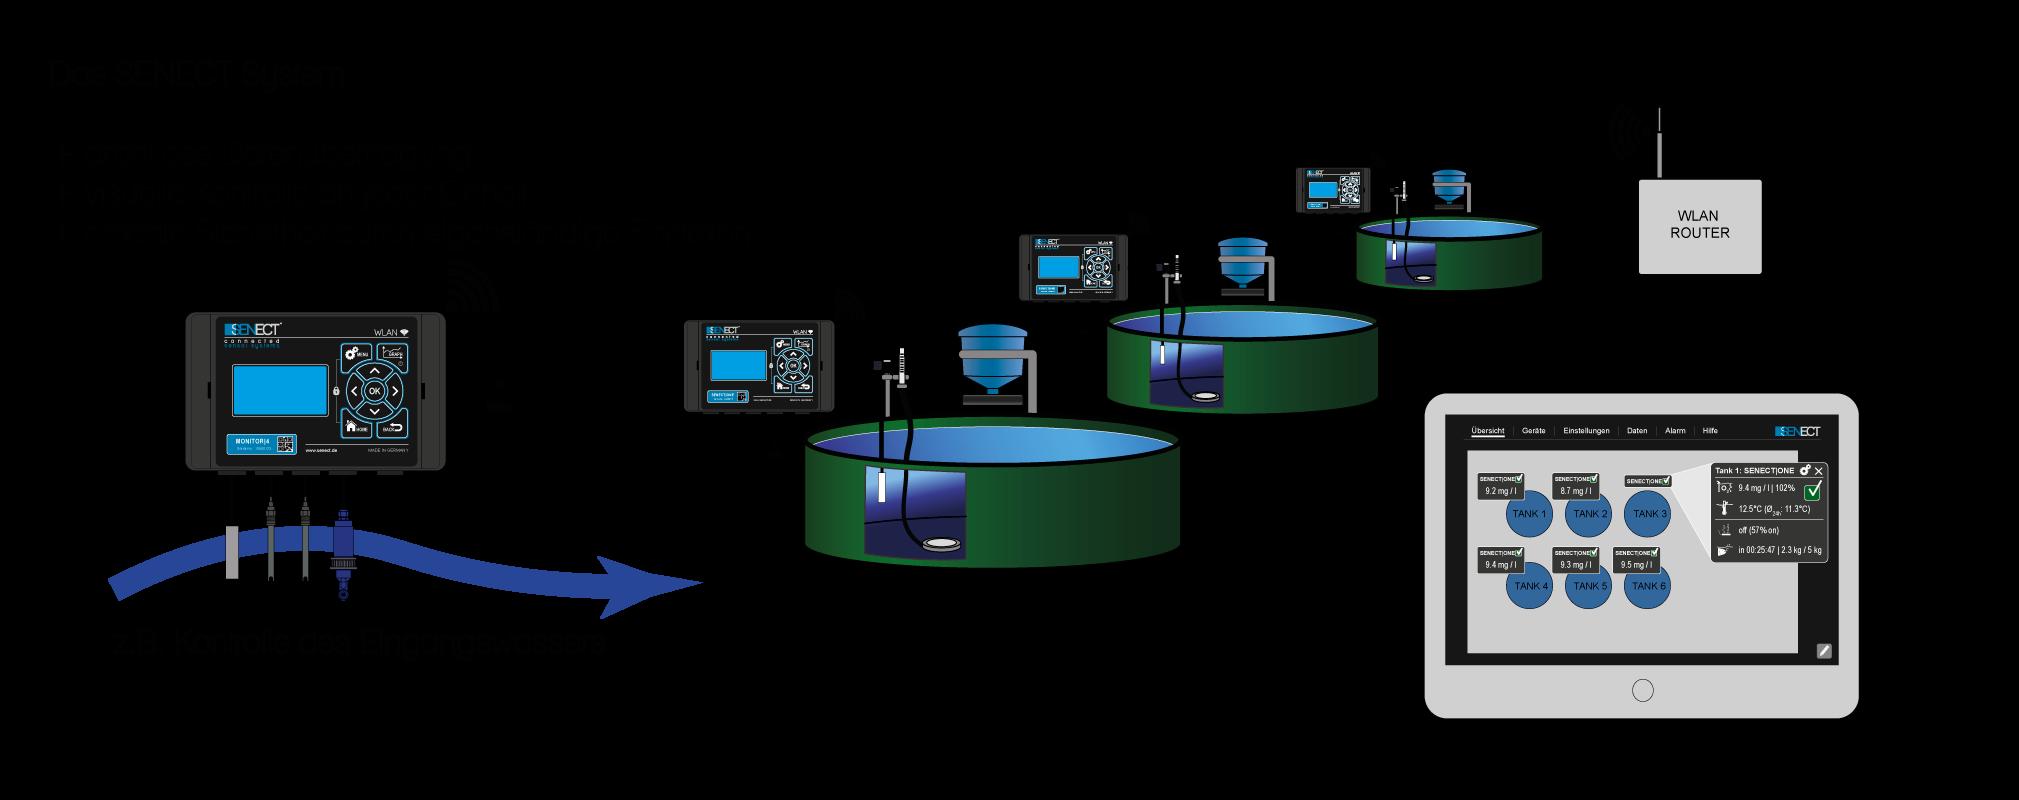 Senect-System_Monitor4_de